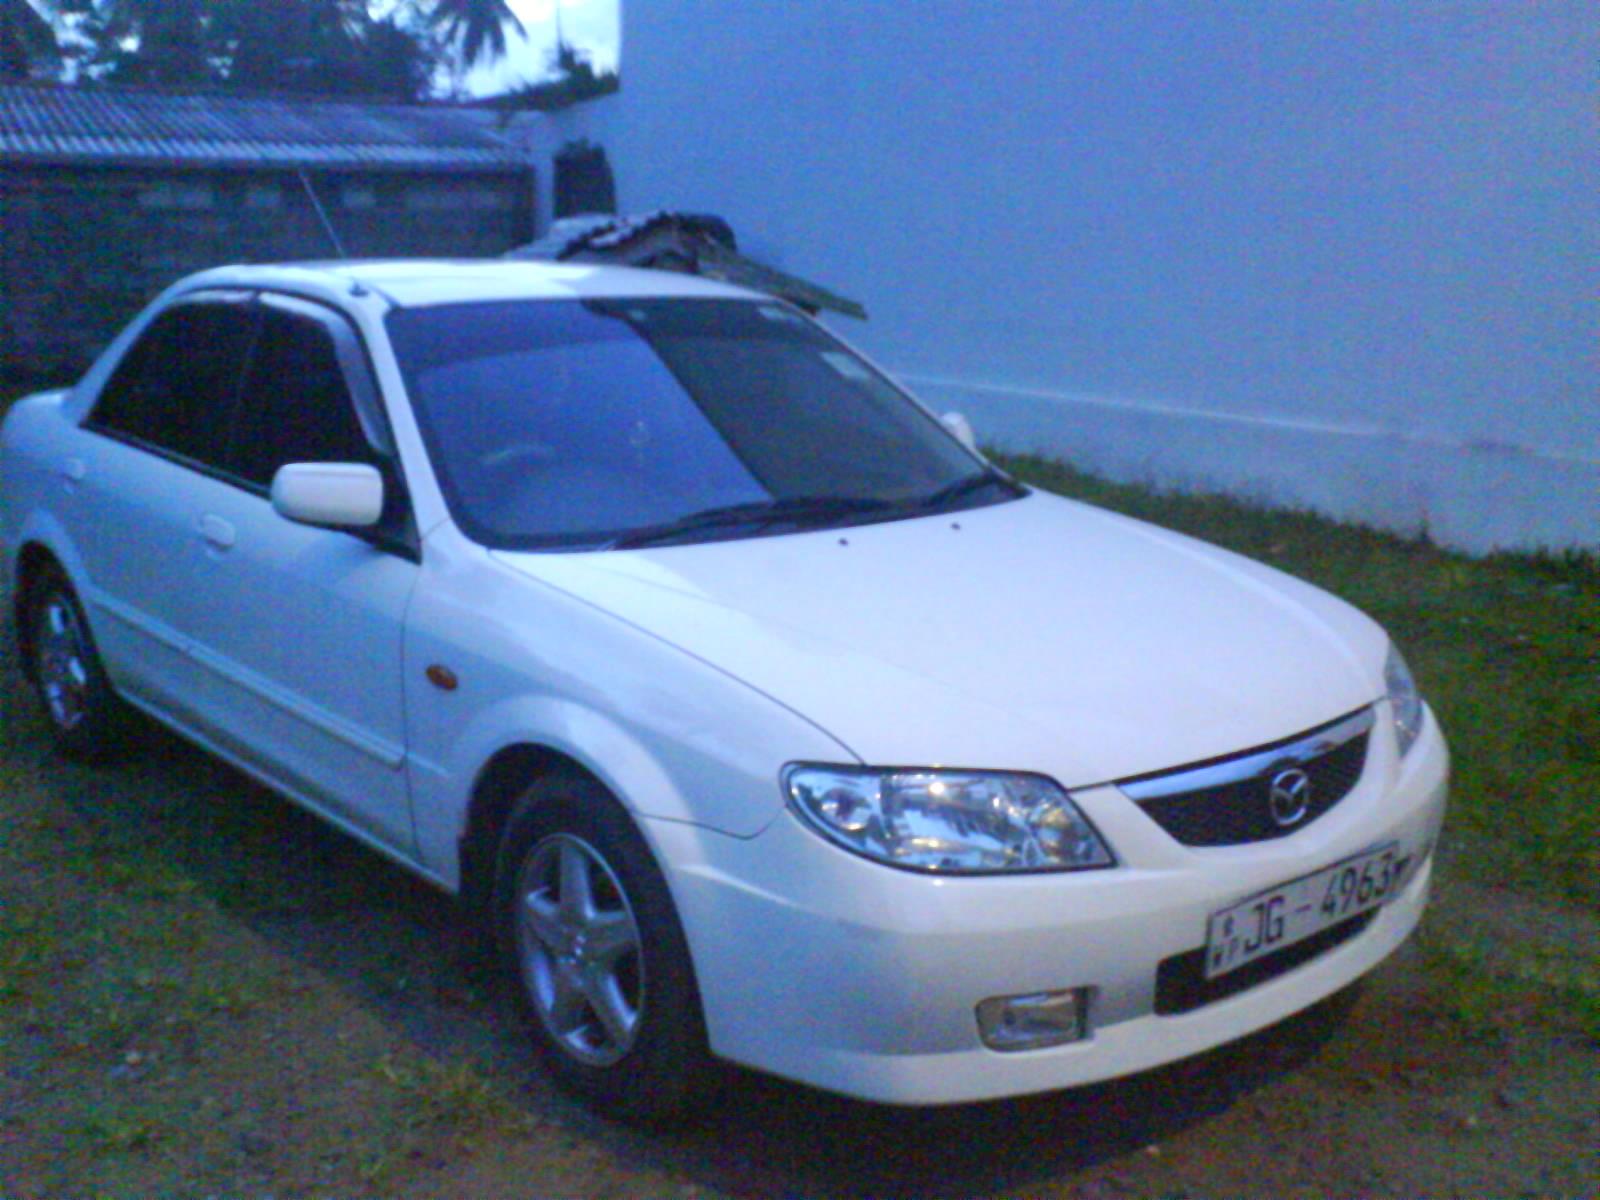 Subaru 0 Financing >> Mazda Familia - Overview - CarGurus